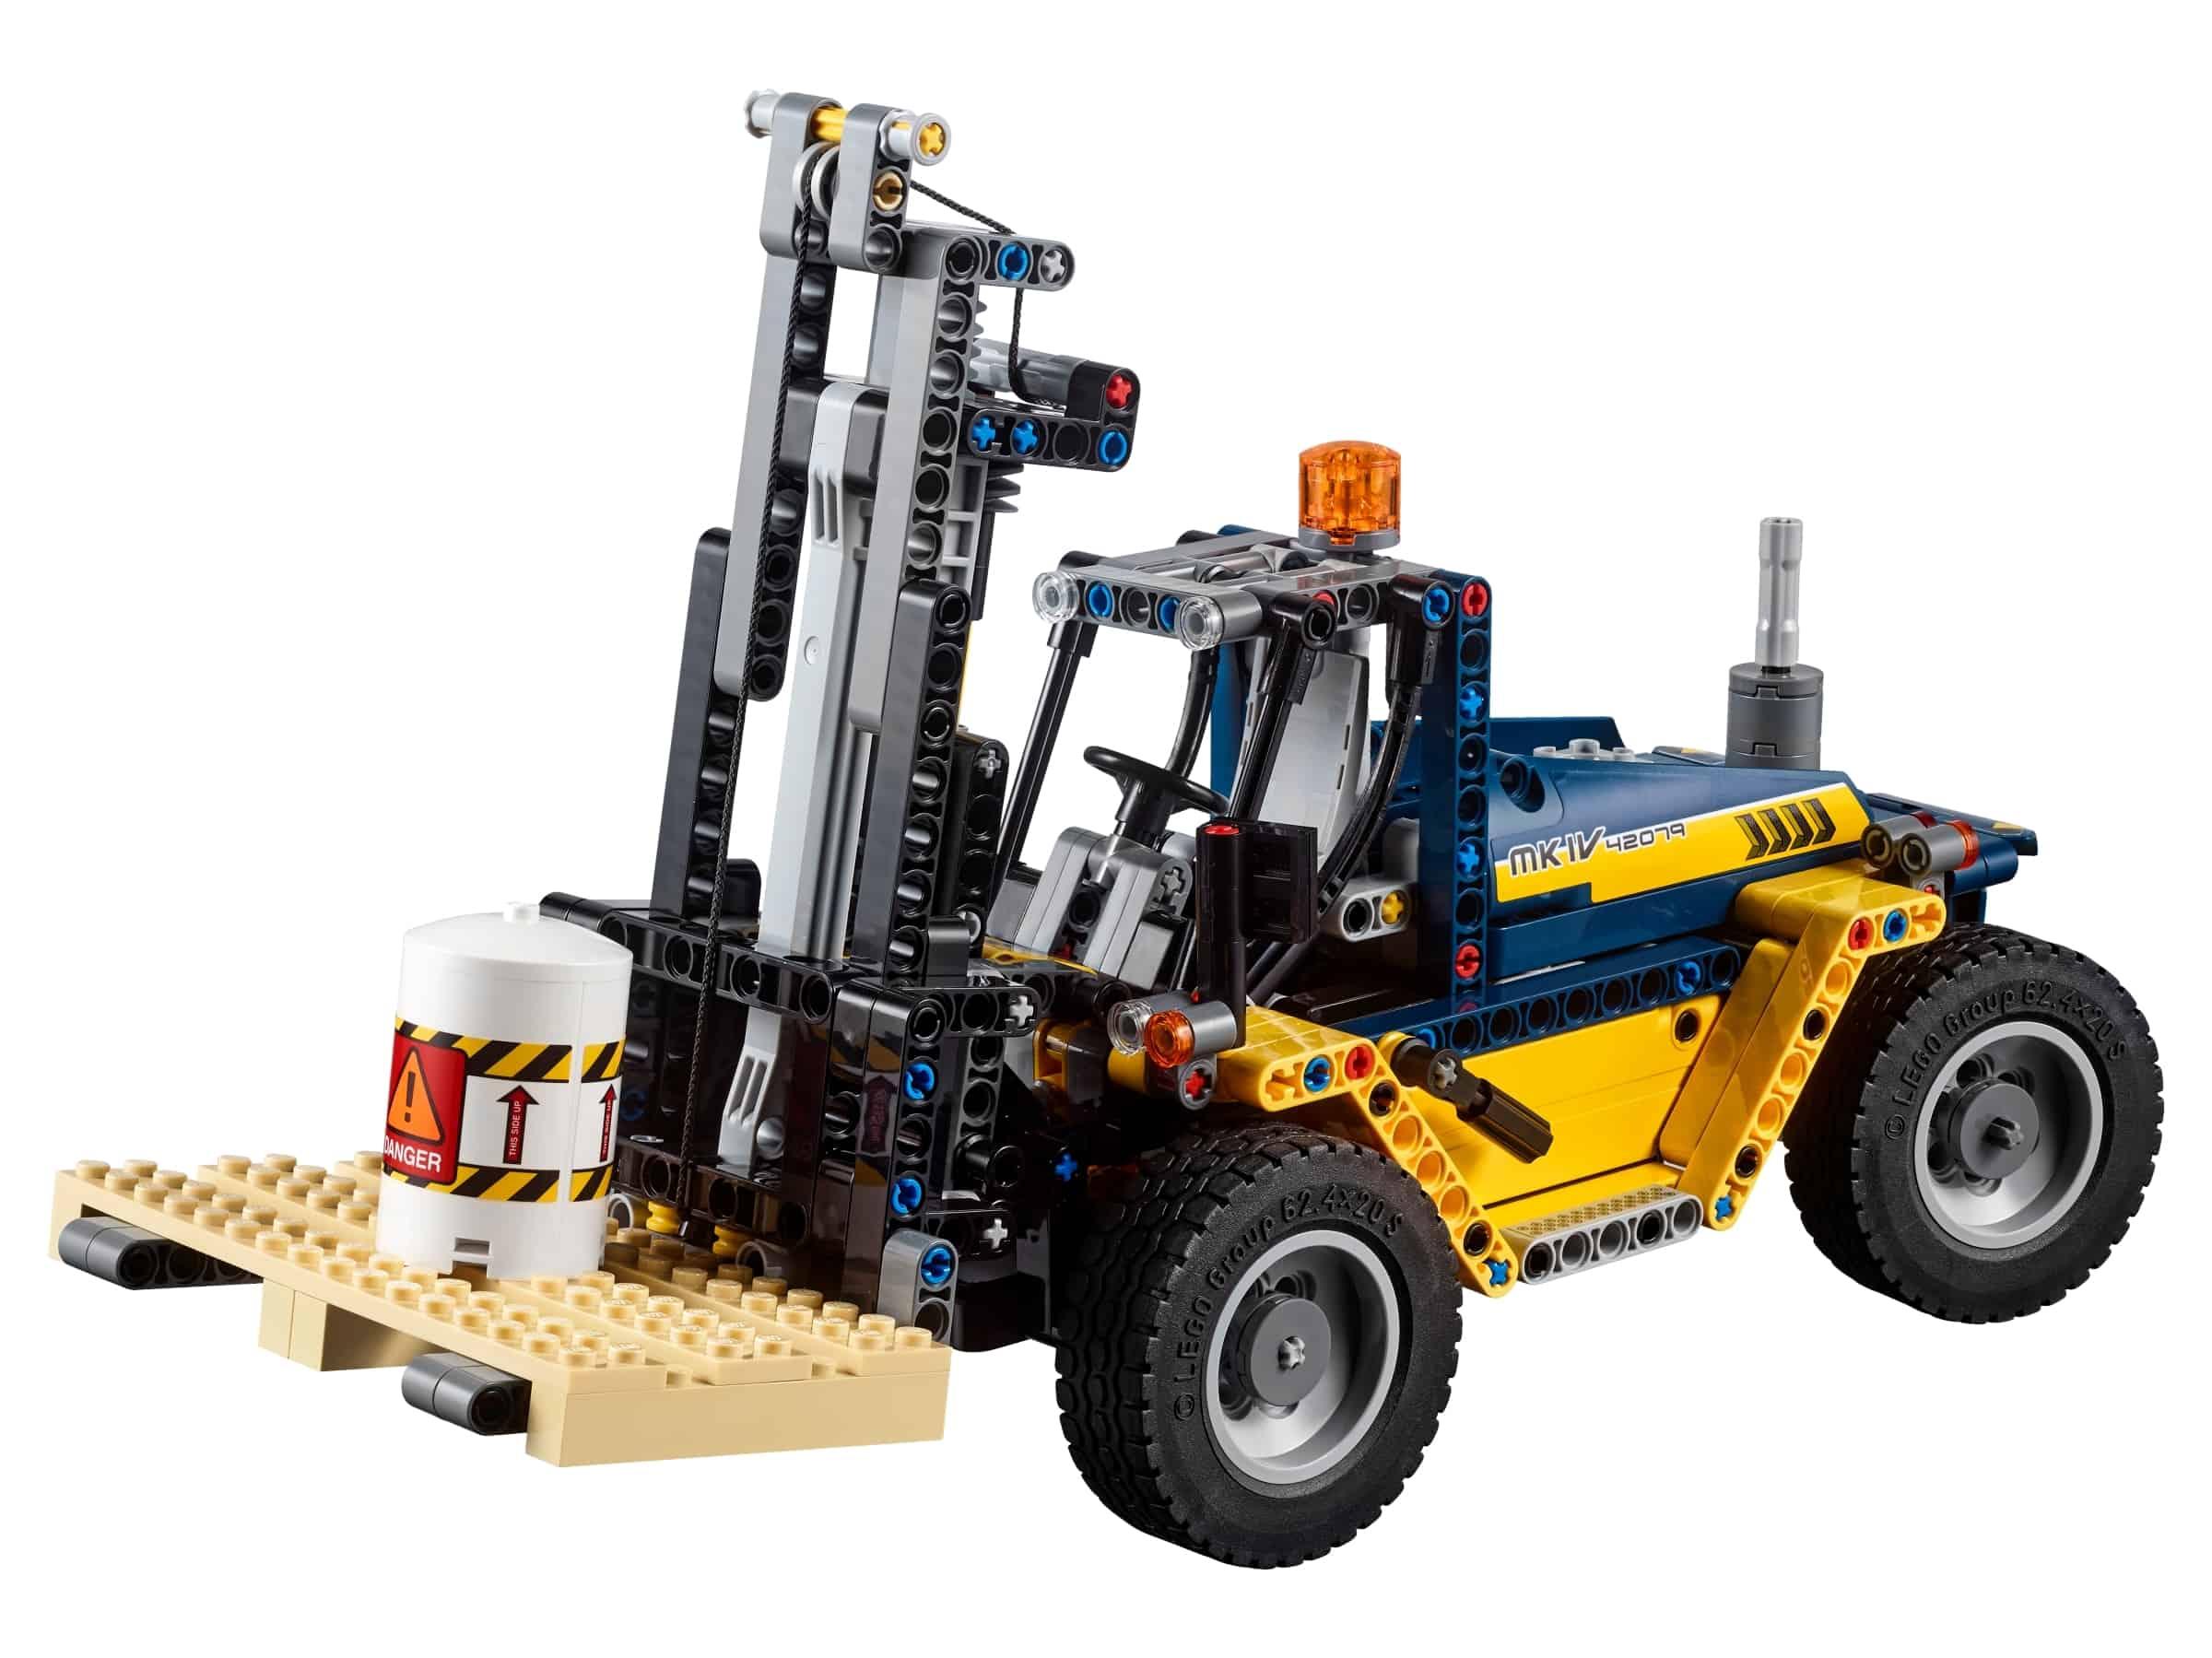 lego robuuste vorkheftruck 42079